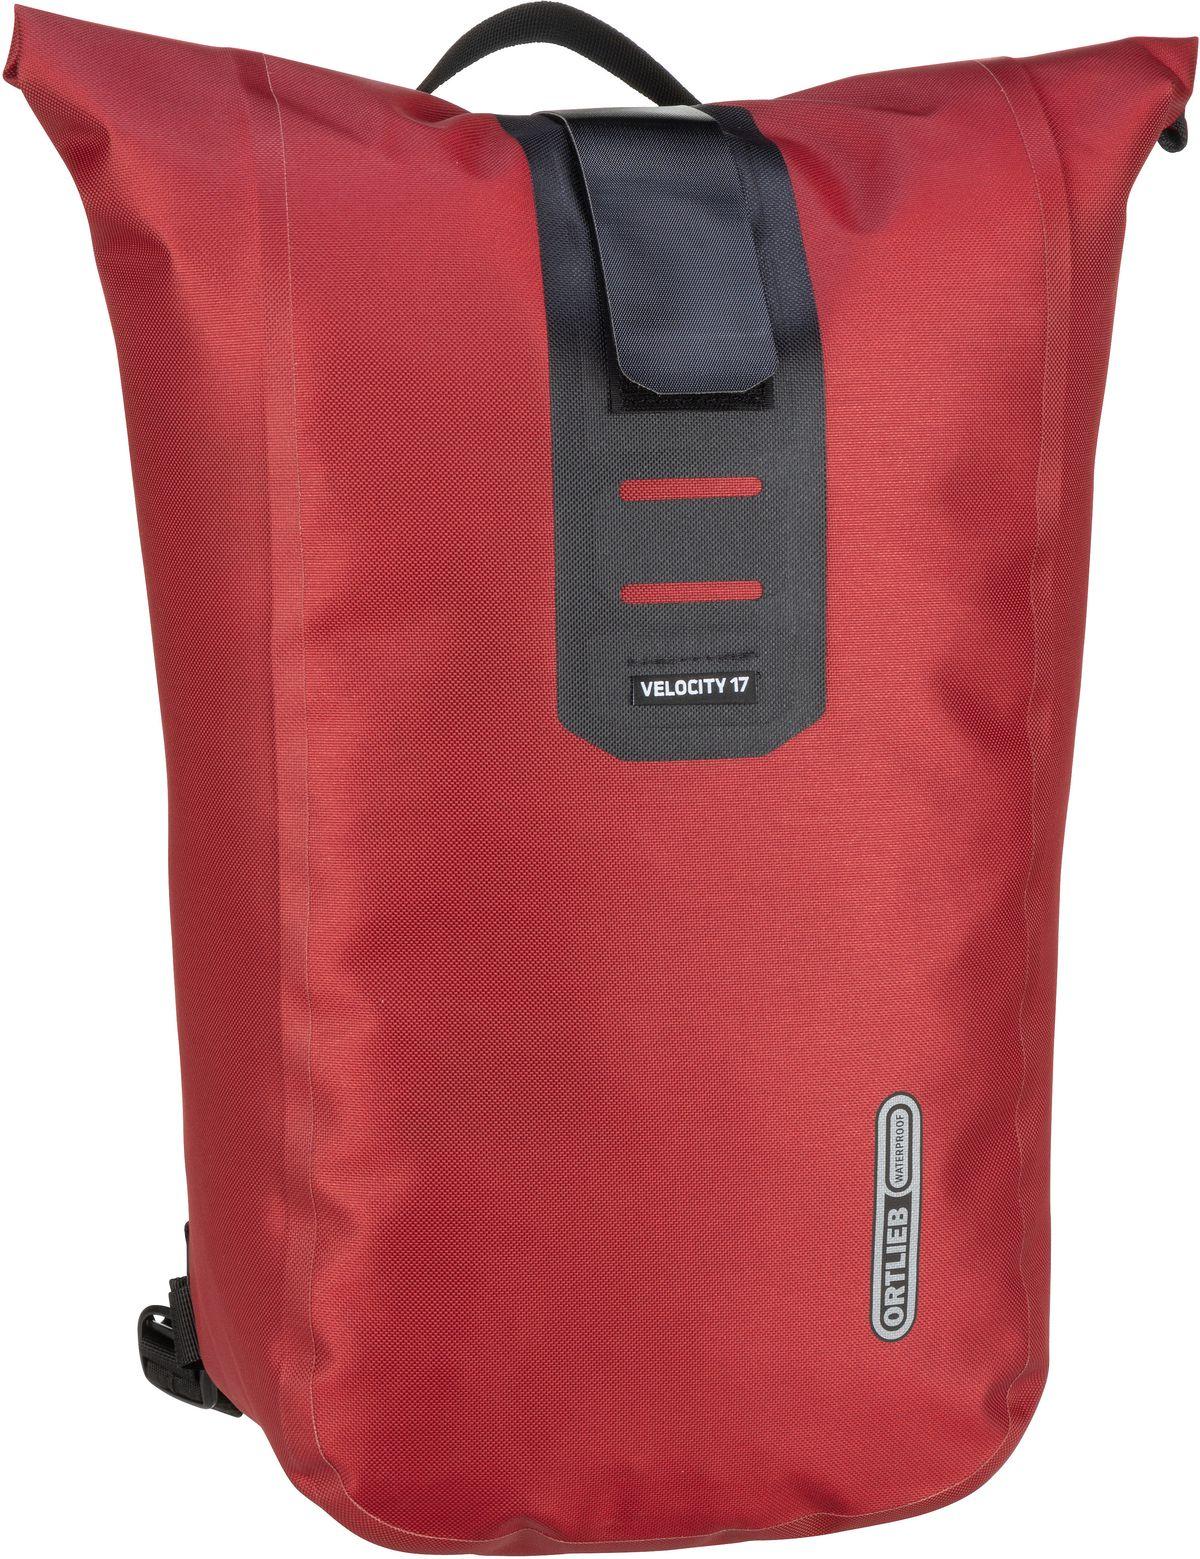 Rucksack / Daypack Velocity PS 17L Dark Chili (17 Liter)